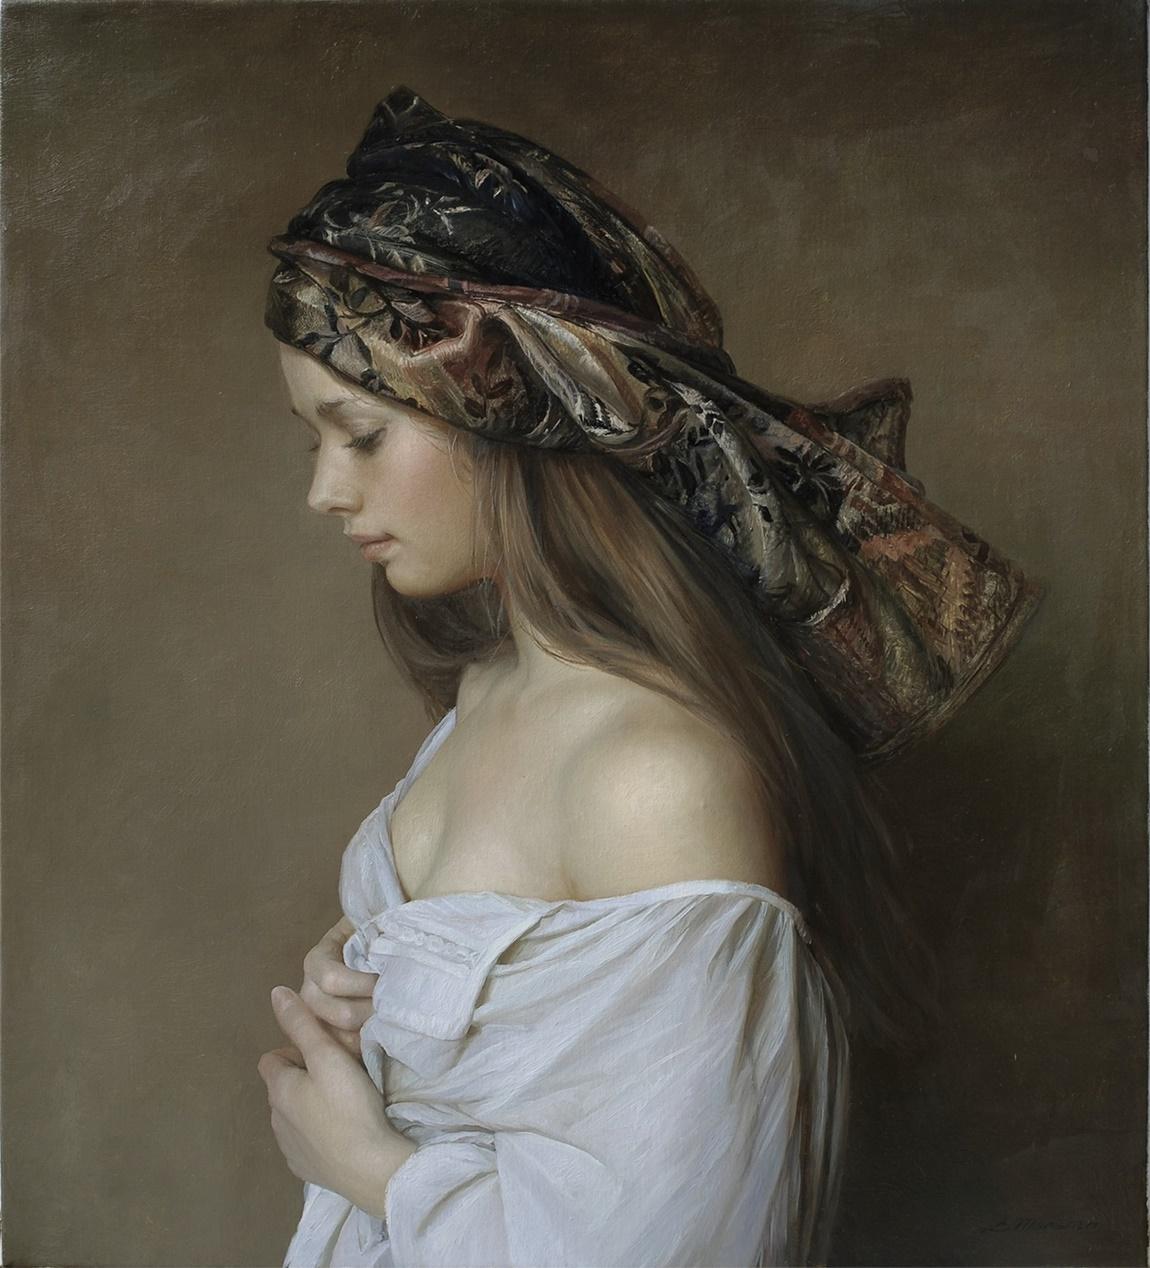 Women's images by a Russian realist artist Sergey Marshennikov - 24